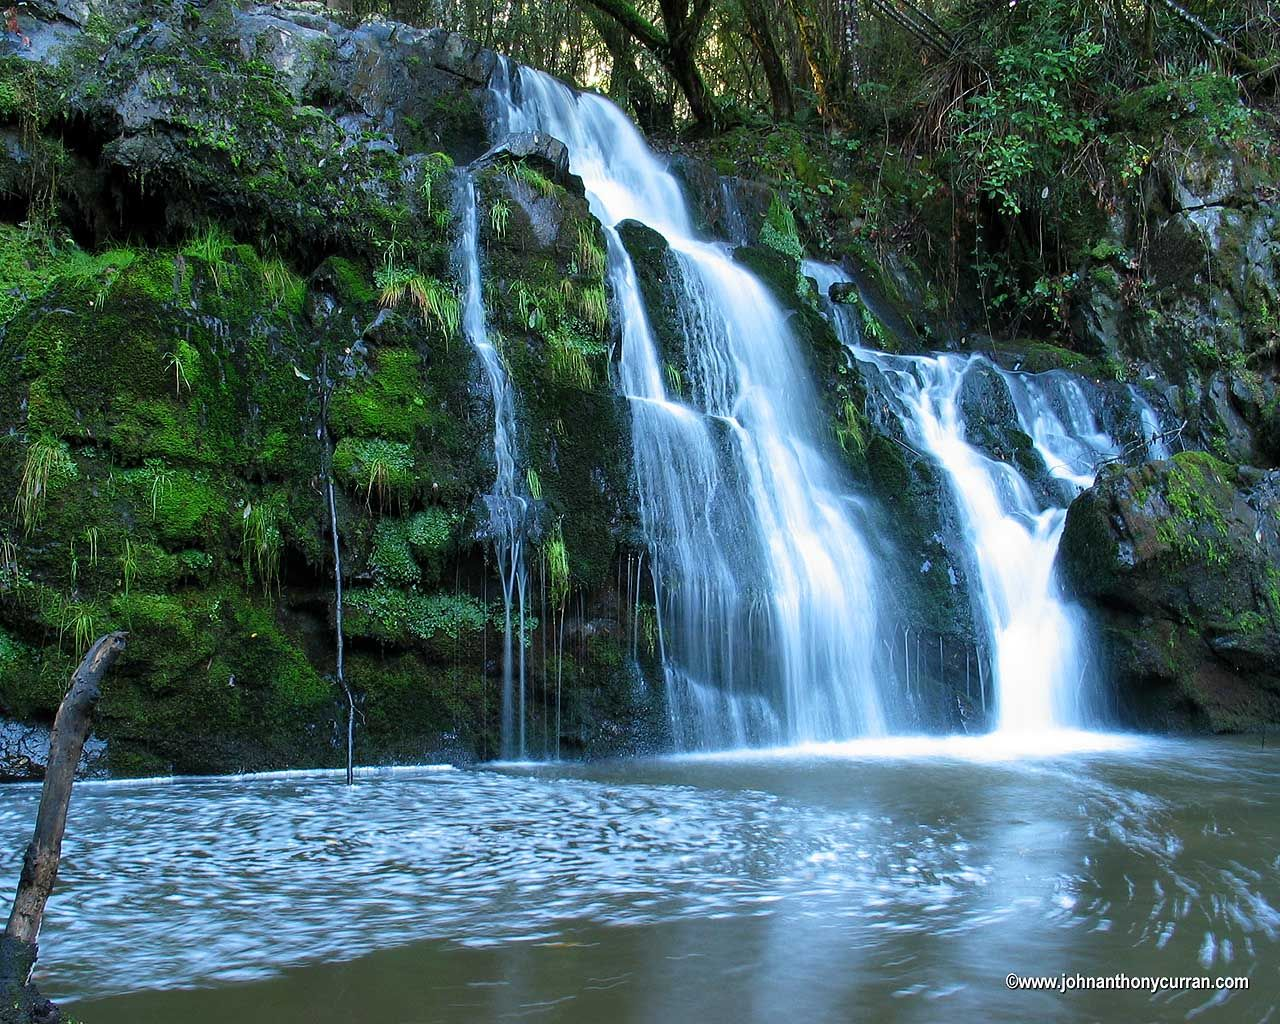 Lilydale Australia